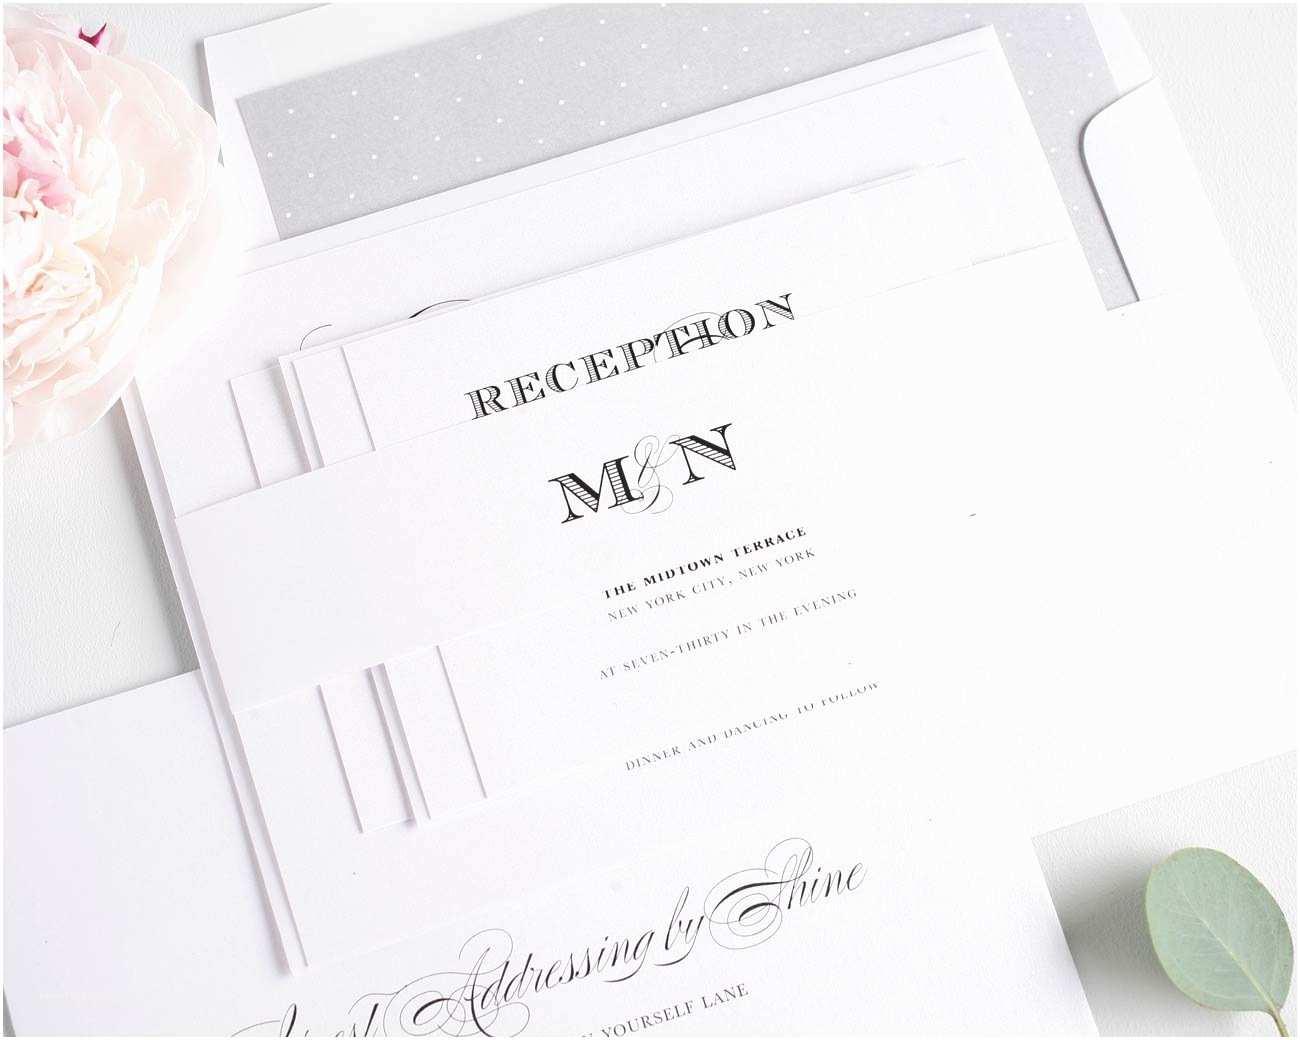 Elegant Wedding Invitations ornate Elegant Wedding Invitations In Black and White